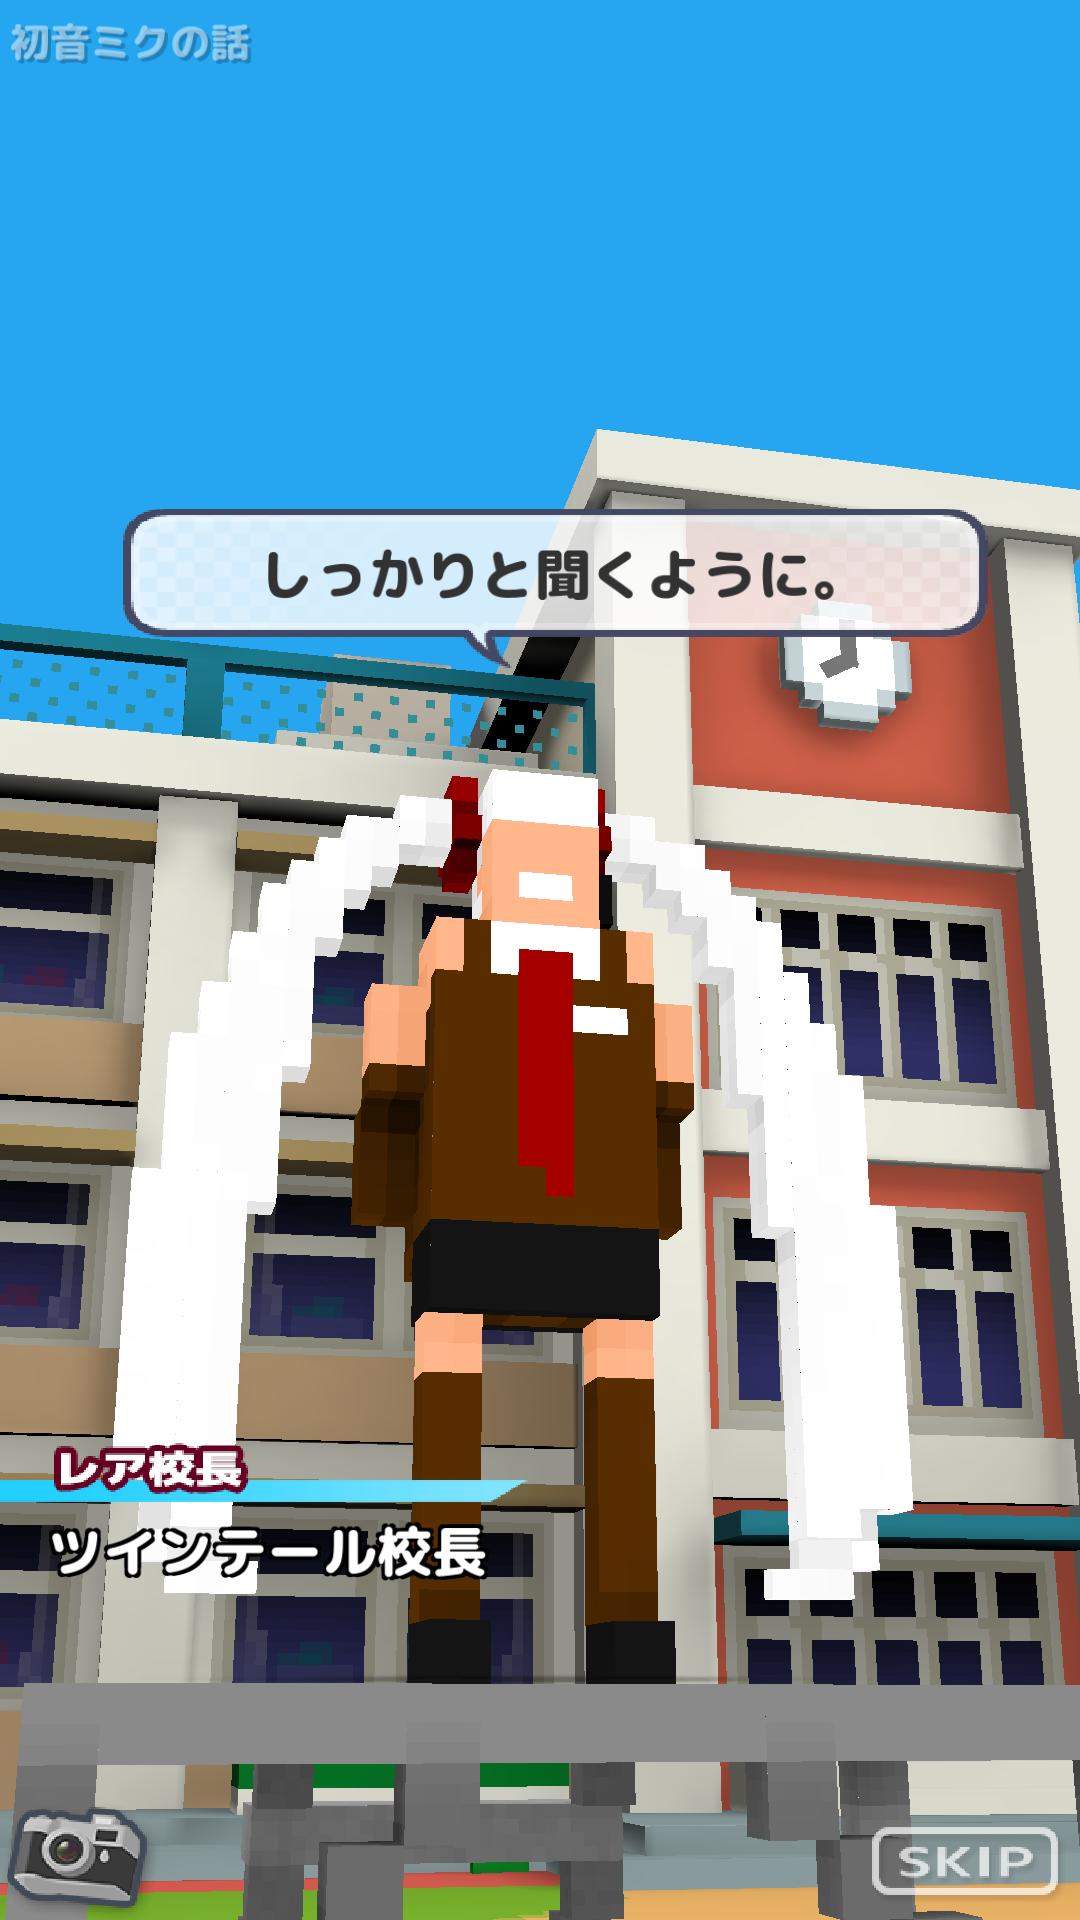 androidアプリ 俺の校長3D攻略スクリーンショット4